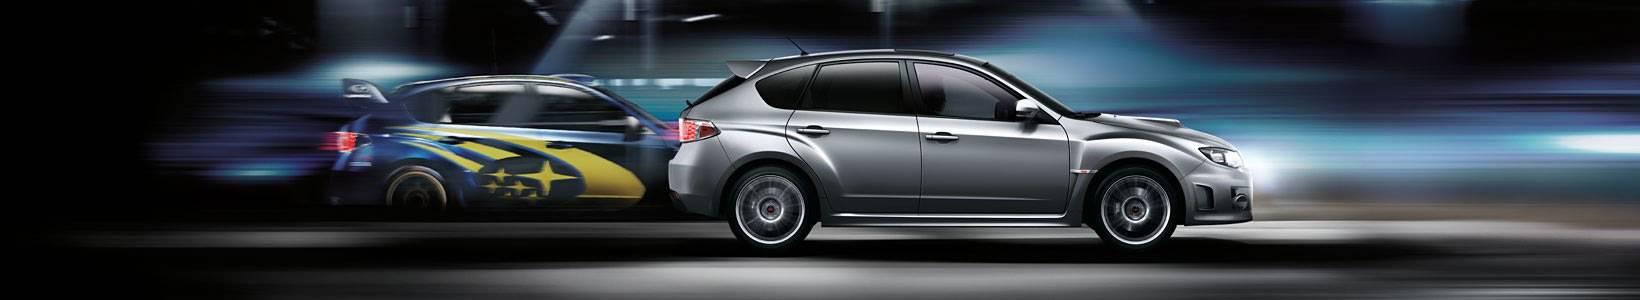 Subaru Careers